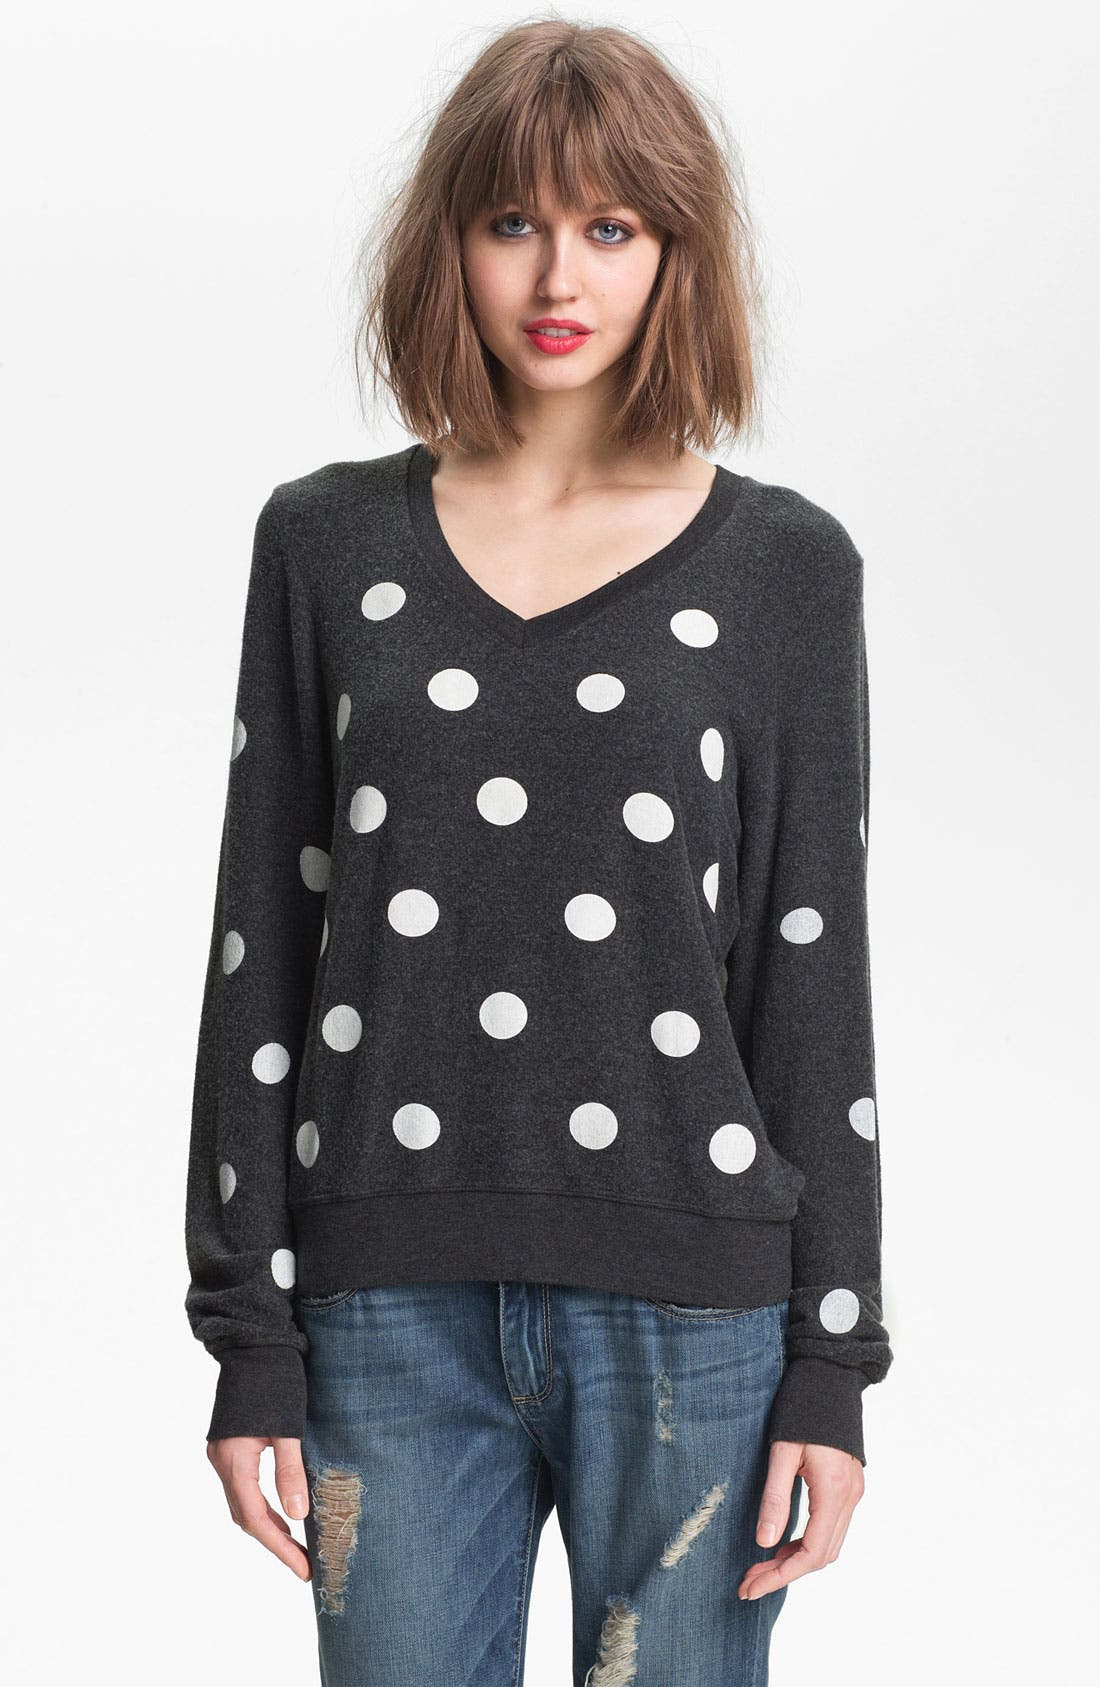 Main Image - Wildfox Polka Dot Sweatshirt (Nordstrom Exclusive)